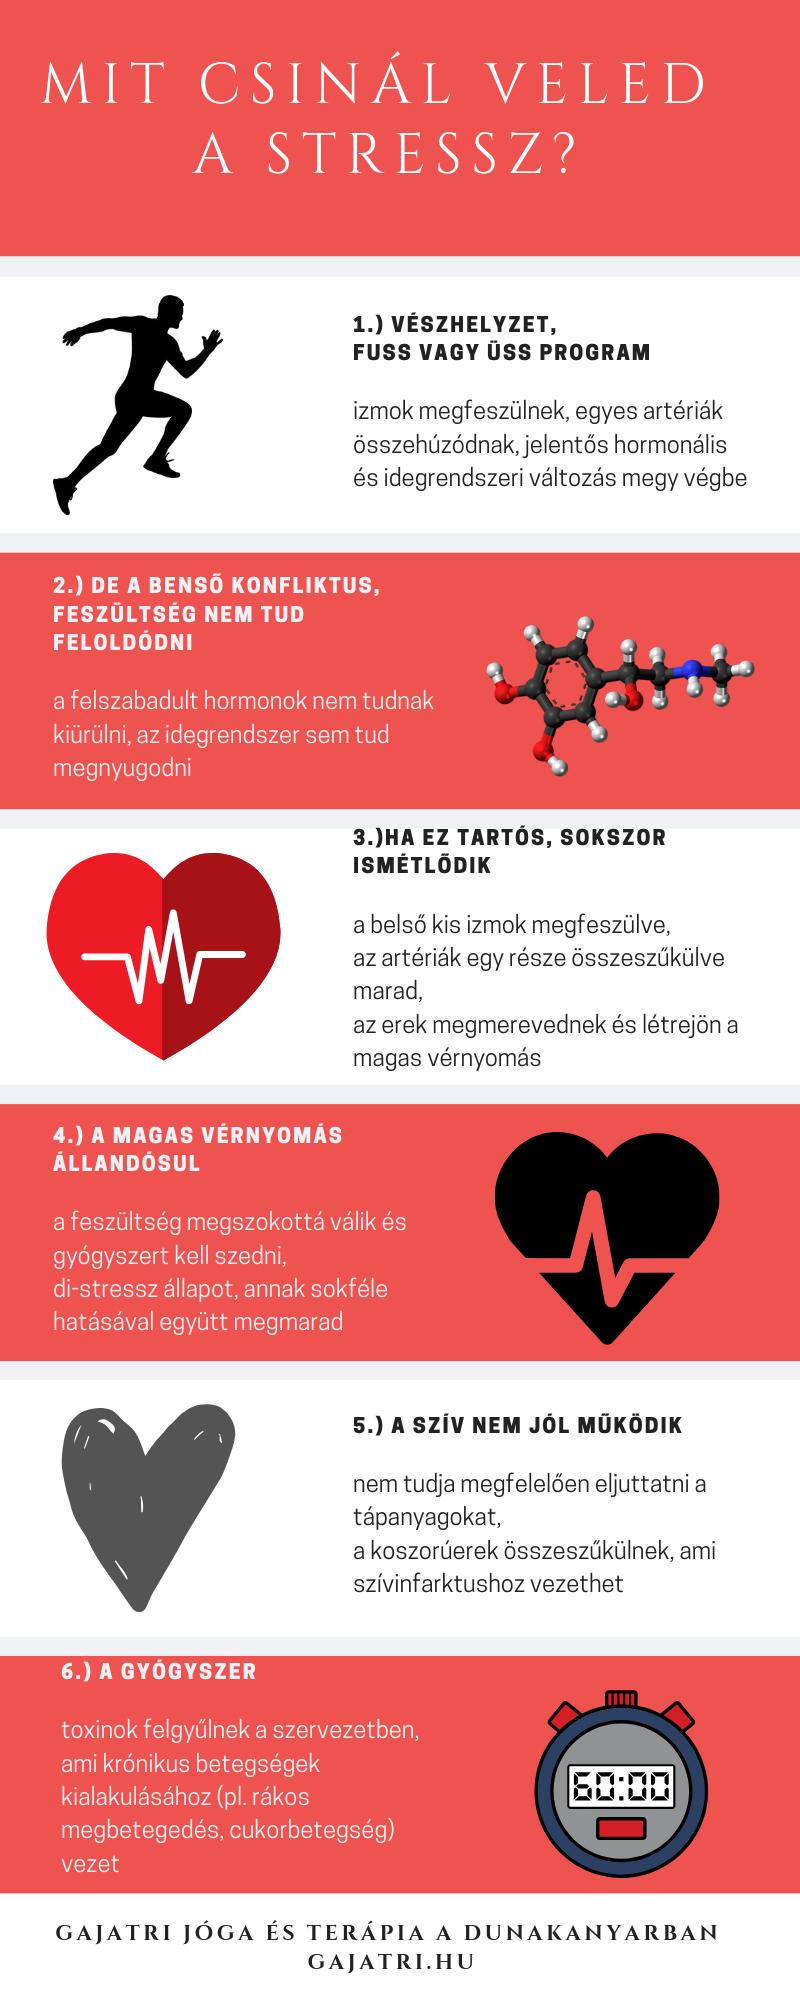 a magas vérnyomás meggyógyul